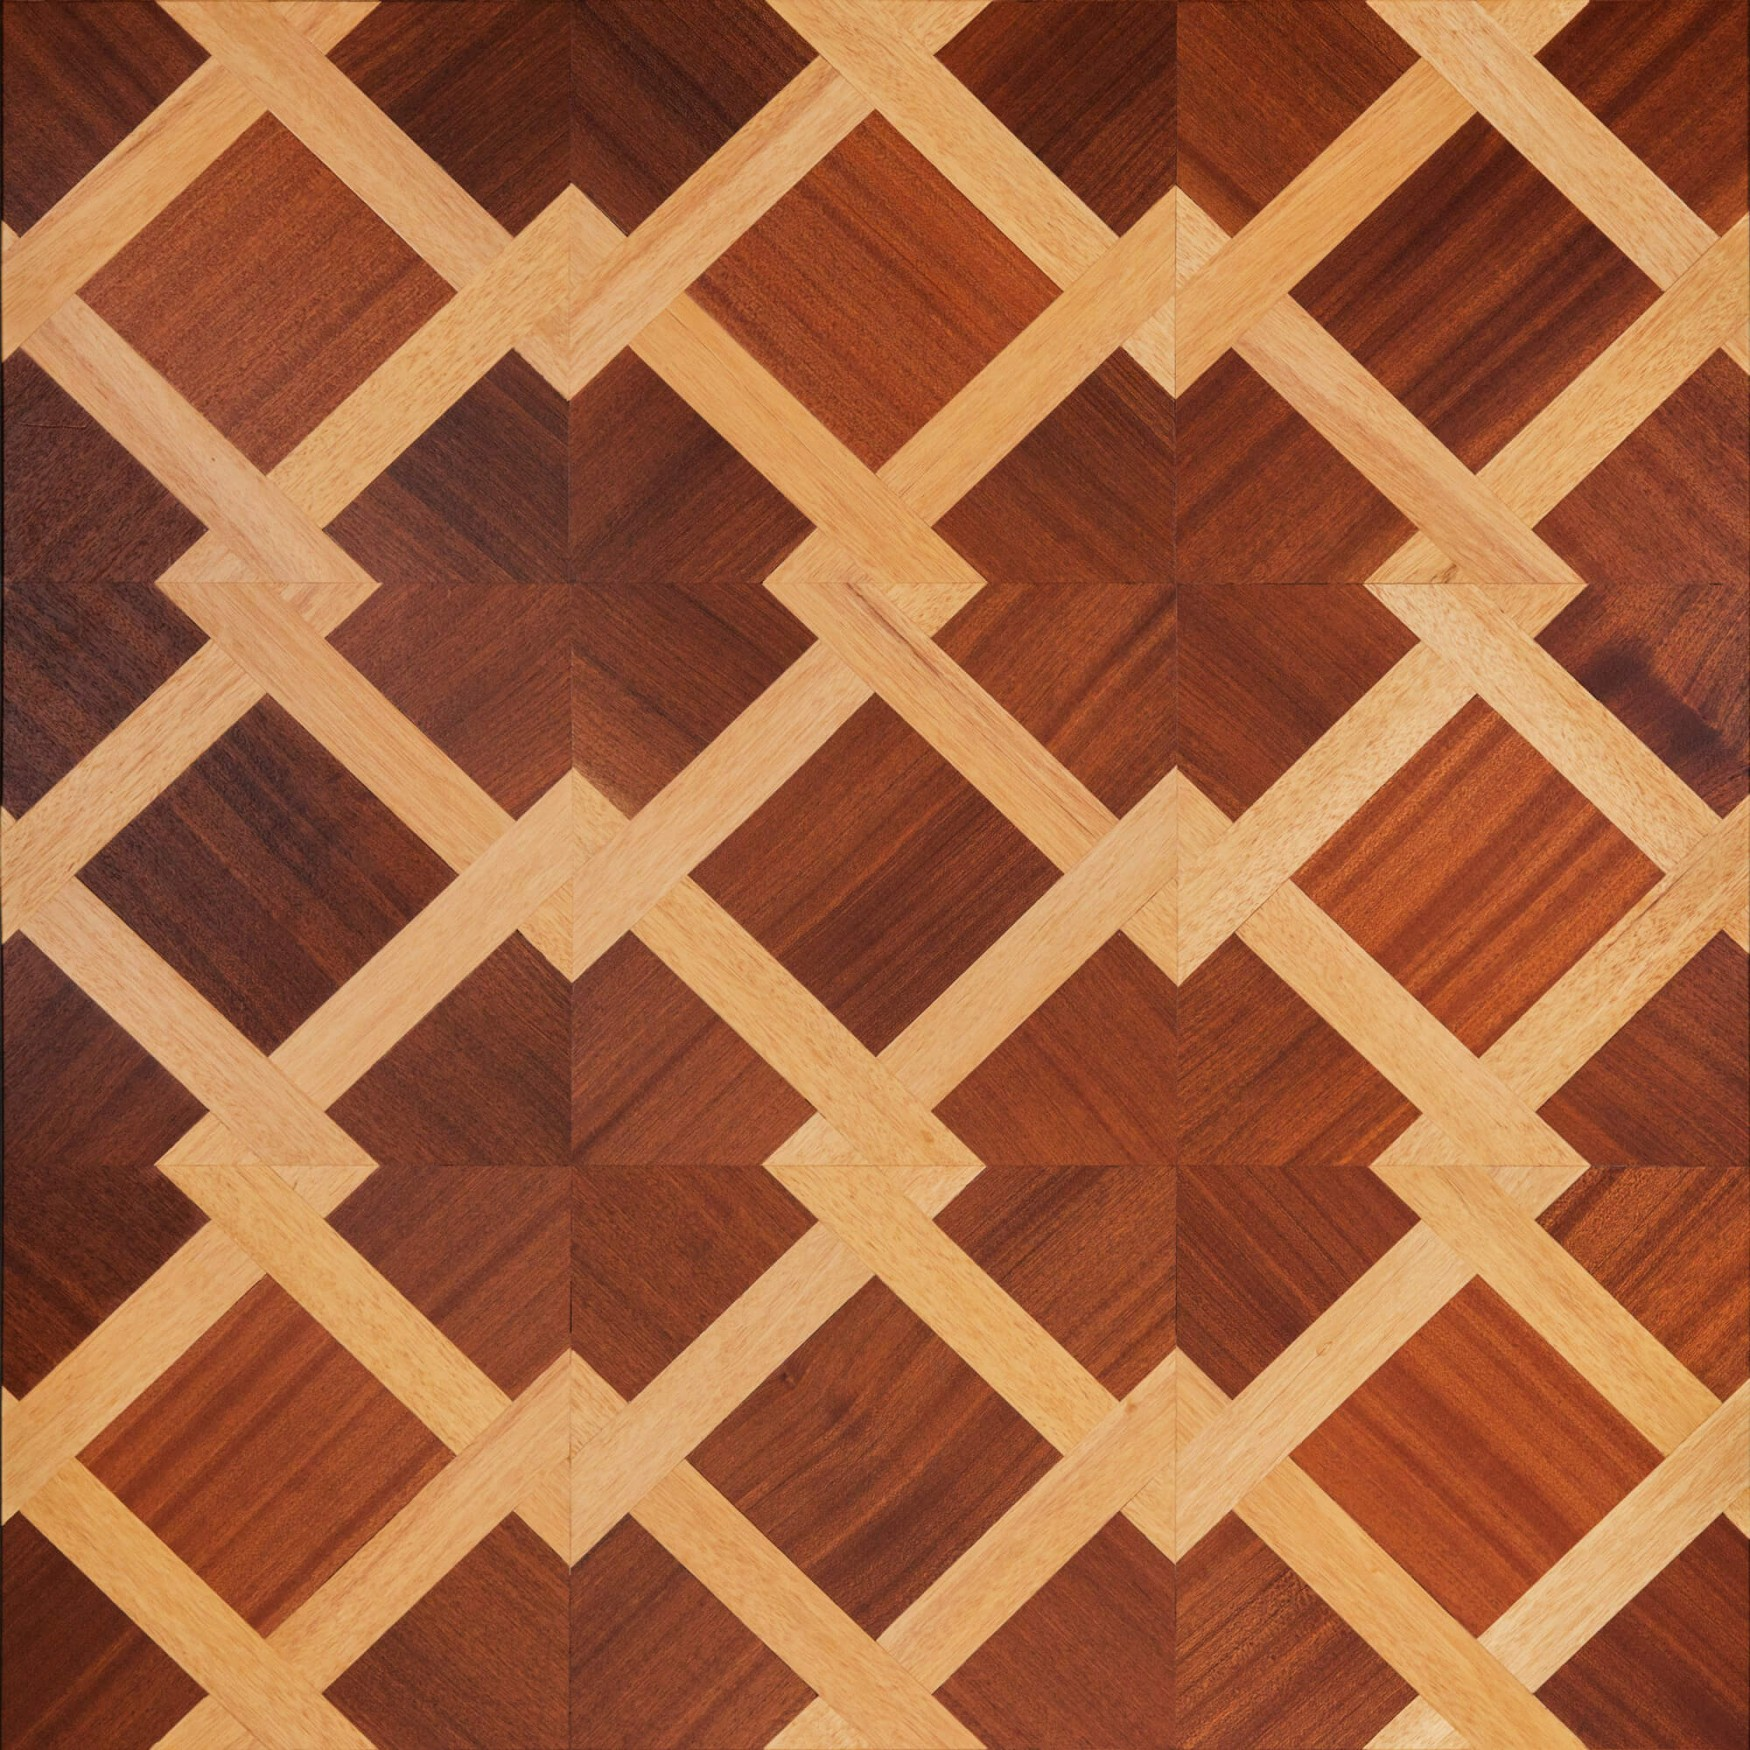 Element7-Bespoke-Floors-Hermitage